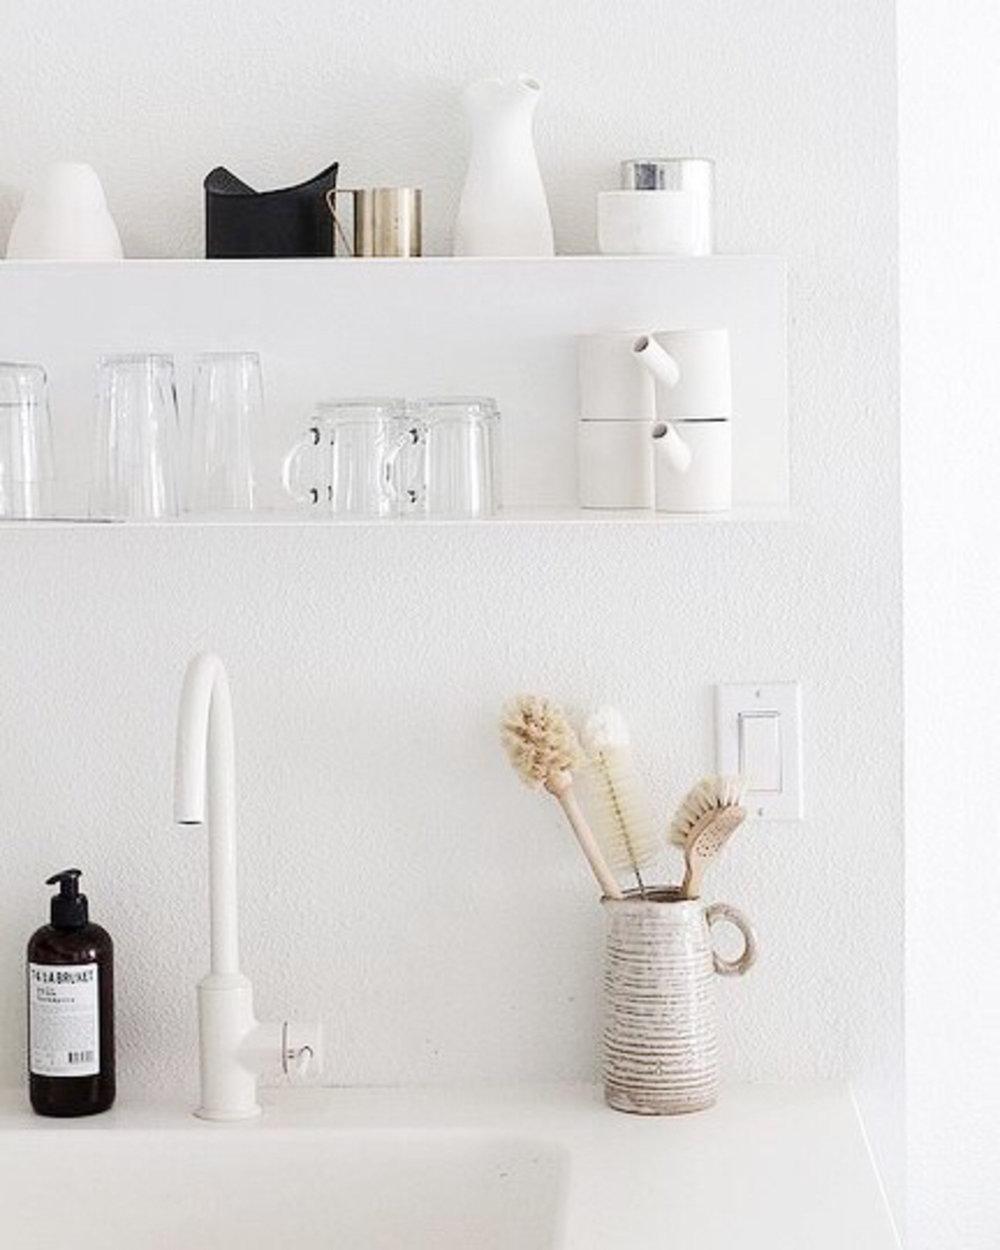 Minimalist Kitchen Guide: the Essentials and the Non-Essentials